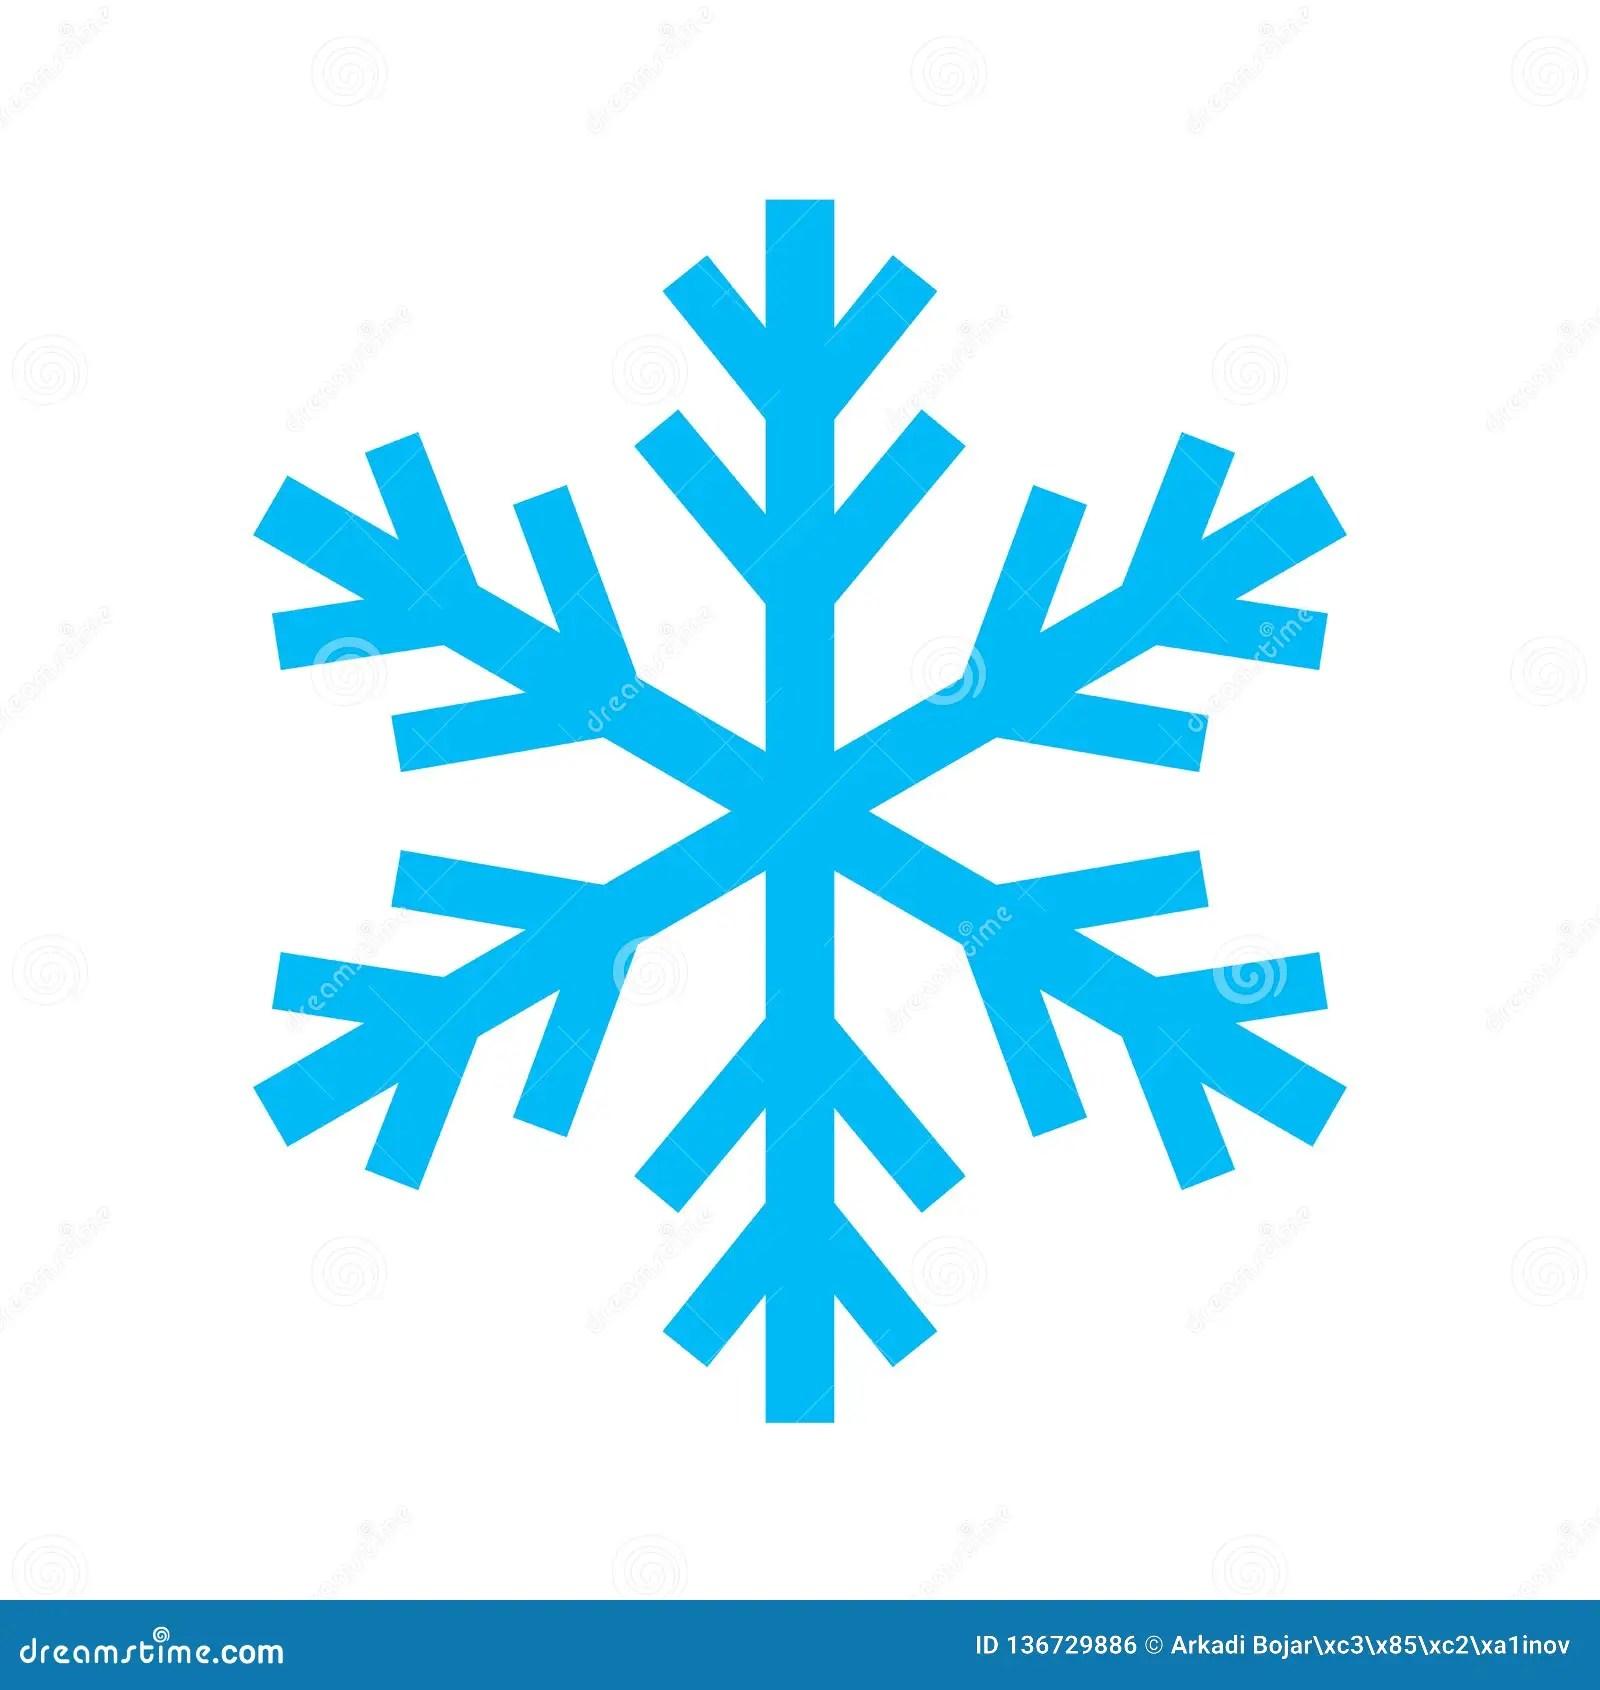 Icone De Vecteur De Flocon De Neige Illustration De Vecteur Illustration Du Humidite Climat 136729886